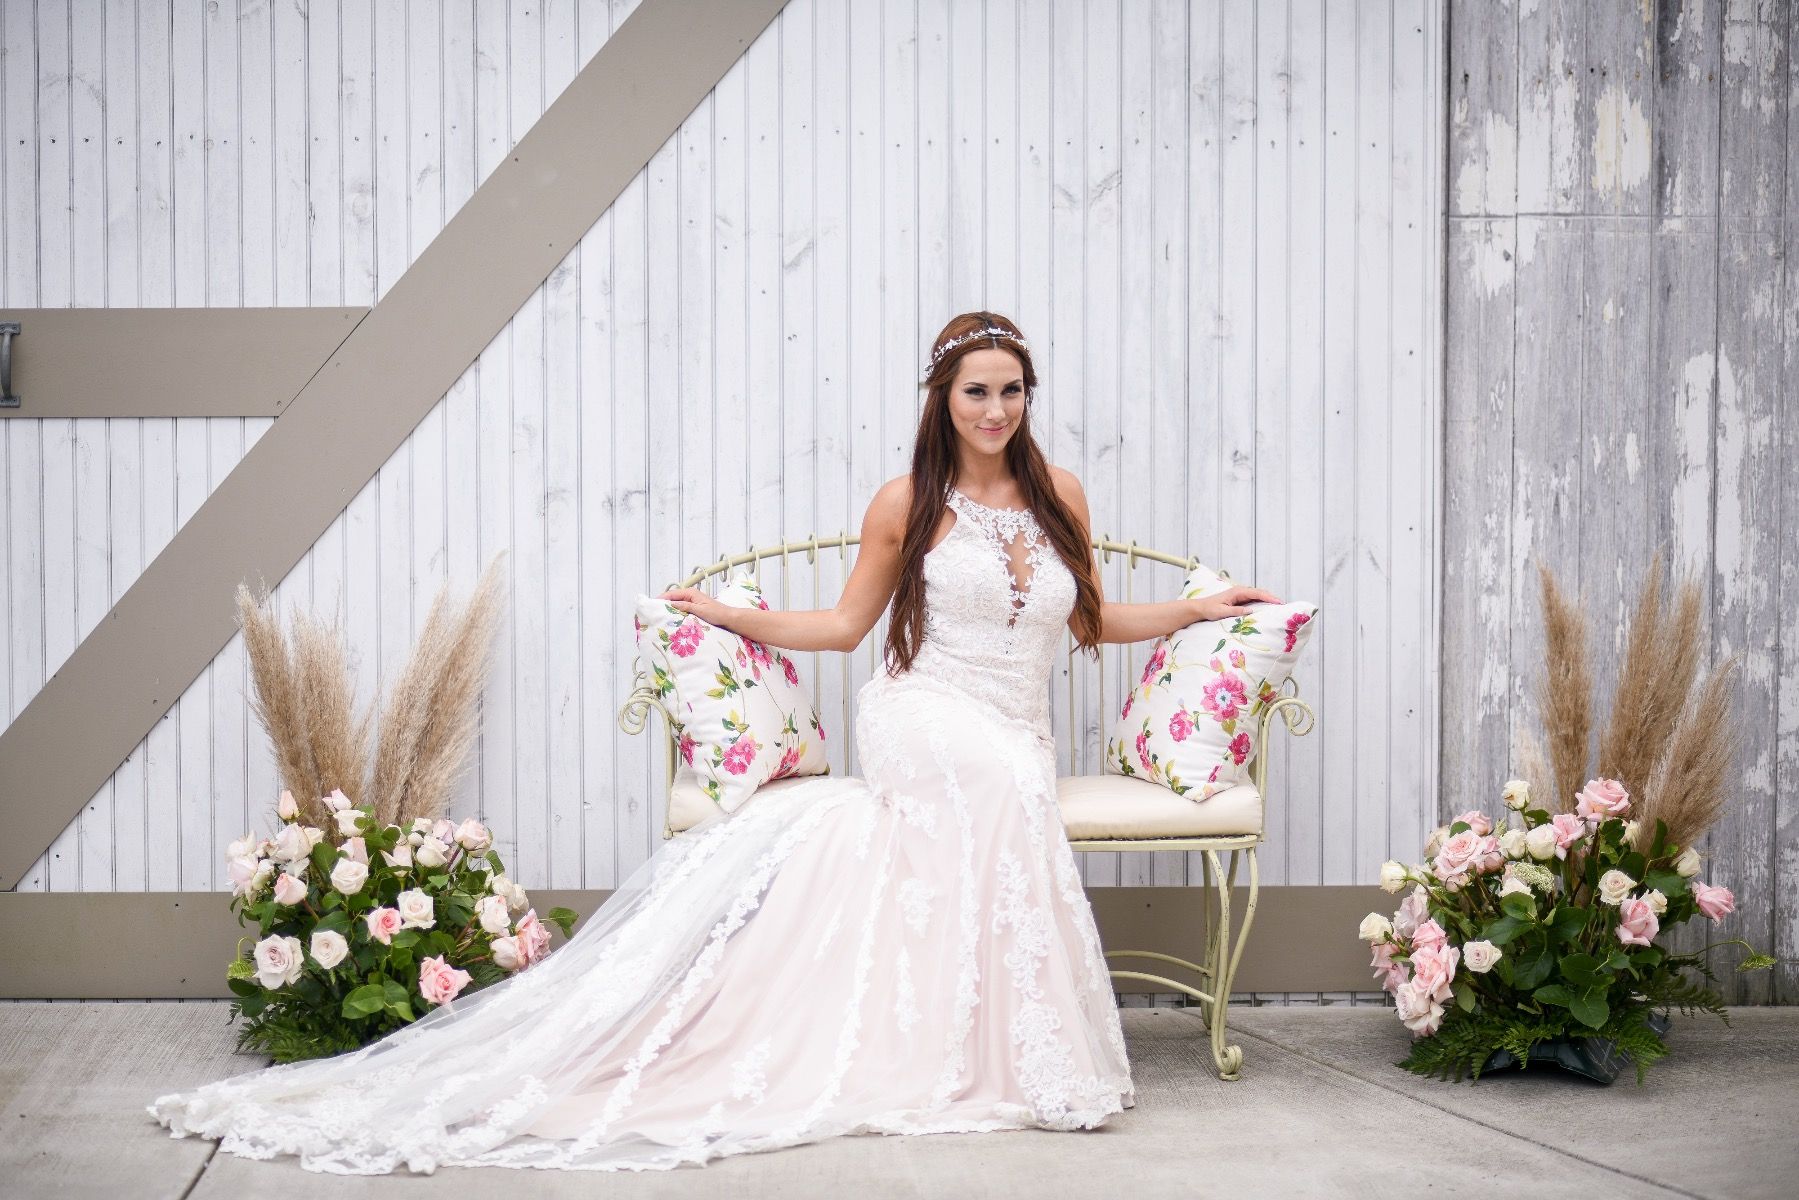 Playa Blanca for Wedding Bride